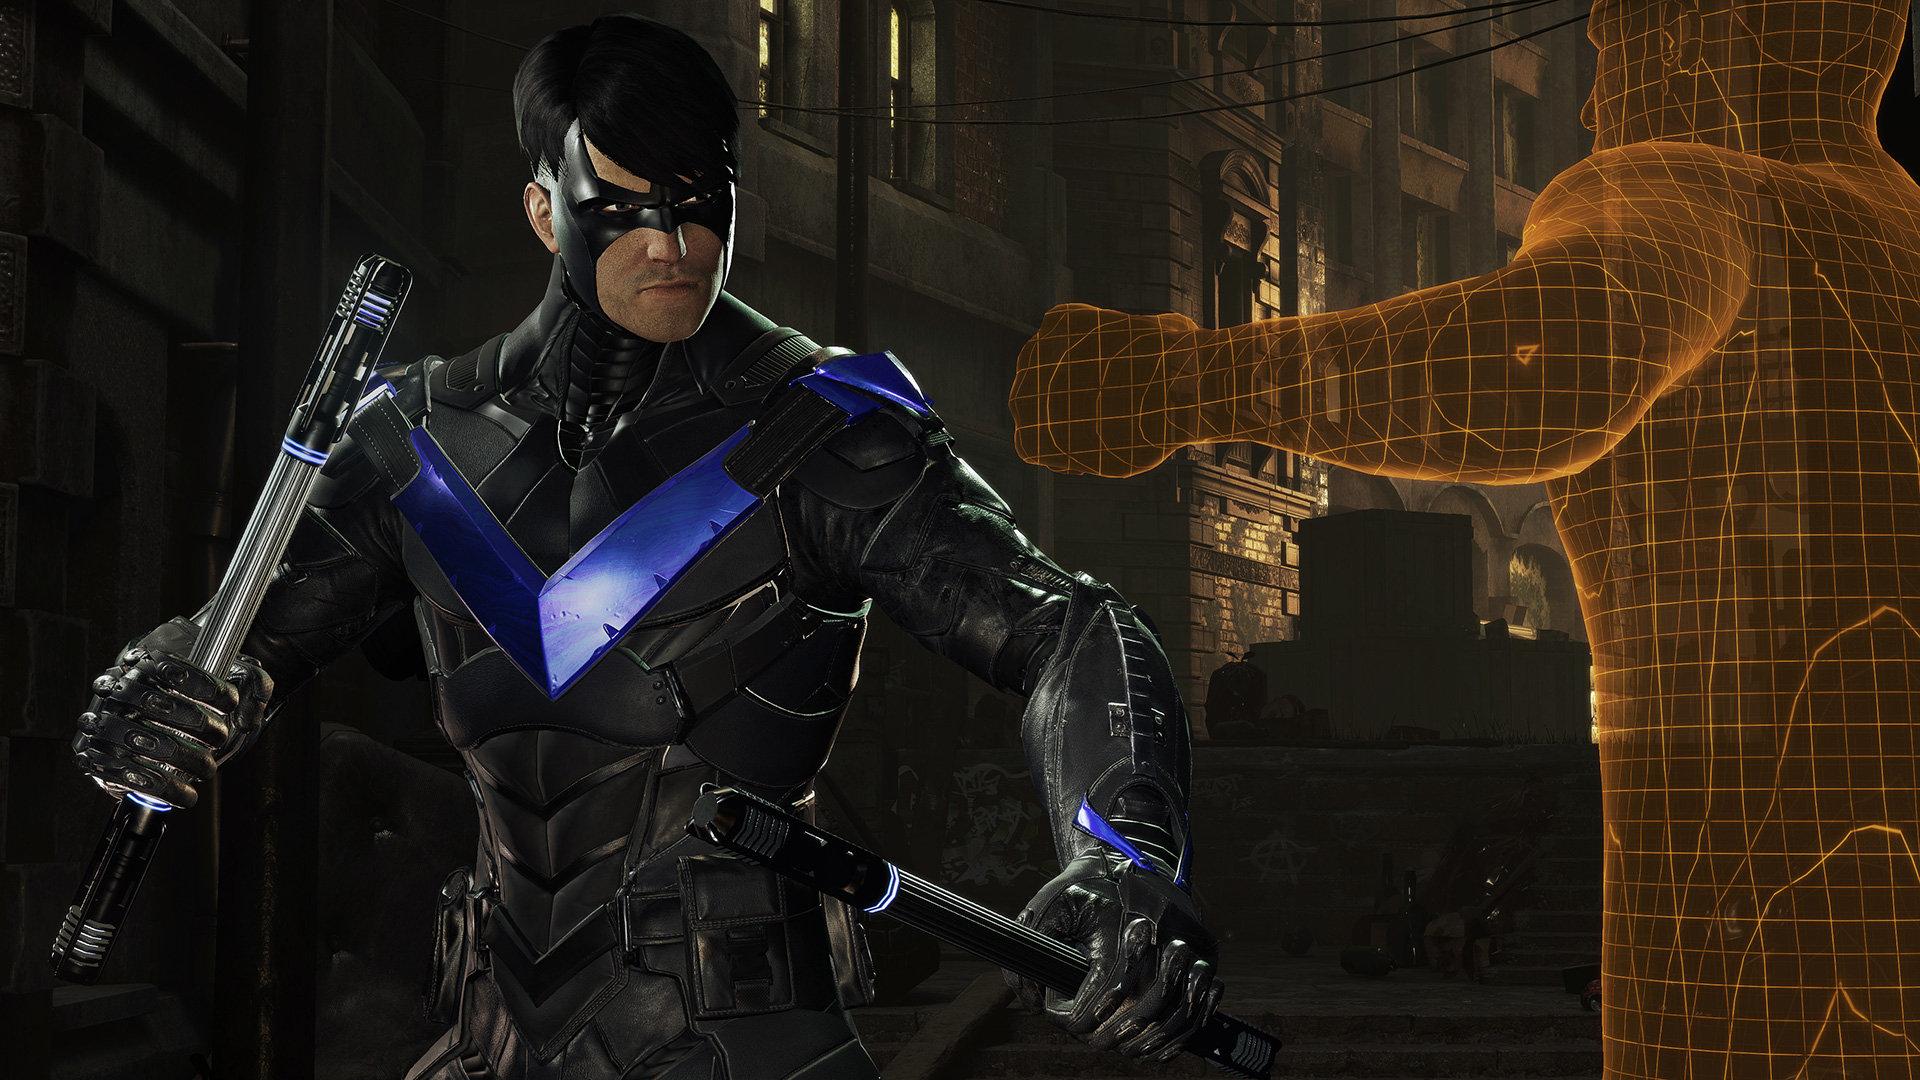 batman-arkham-vr-screen-02-ps4-eu-15jul16.jpg